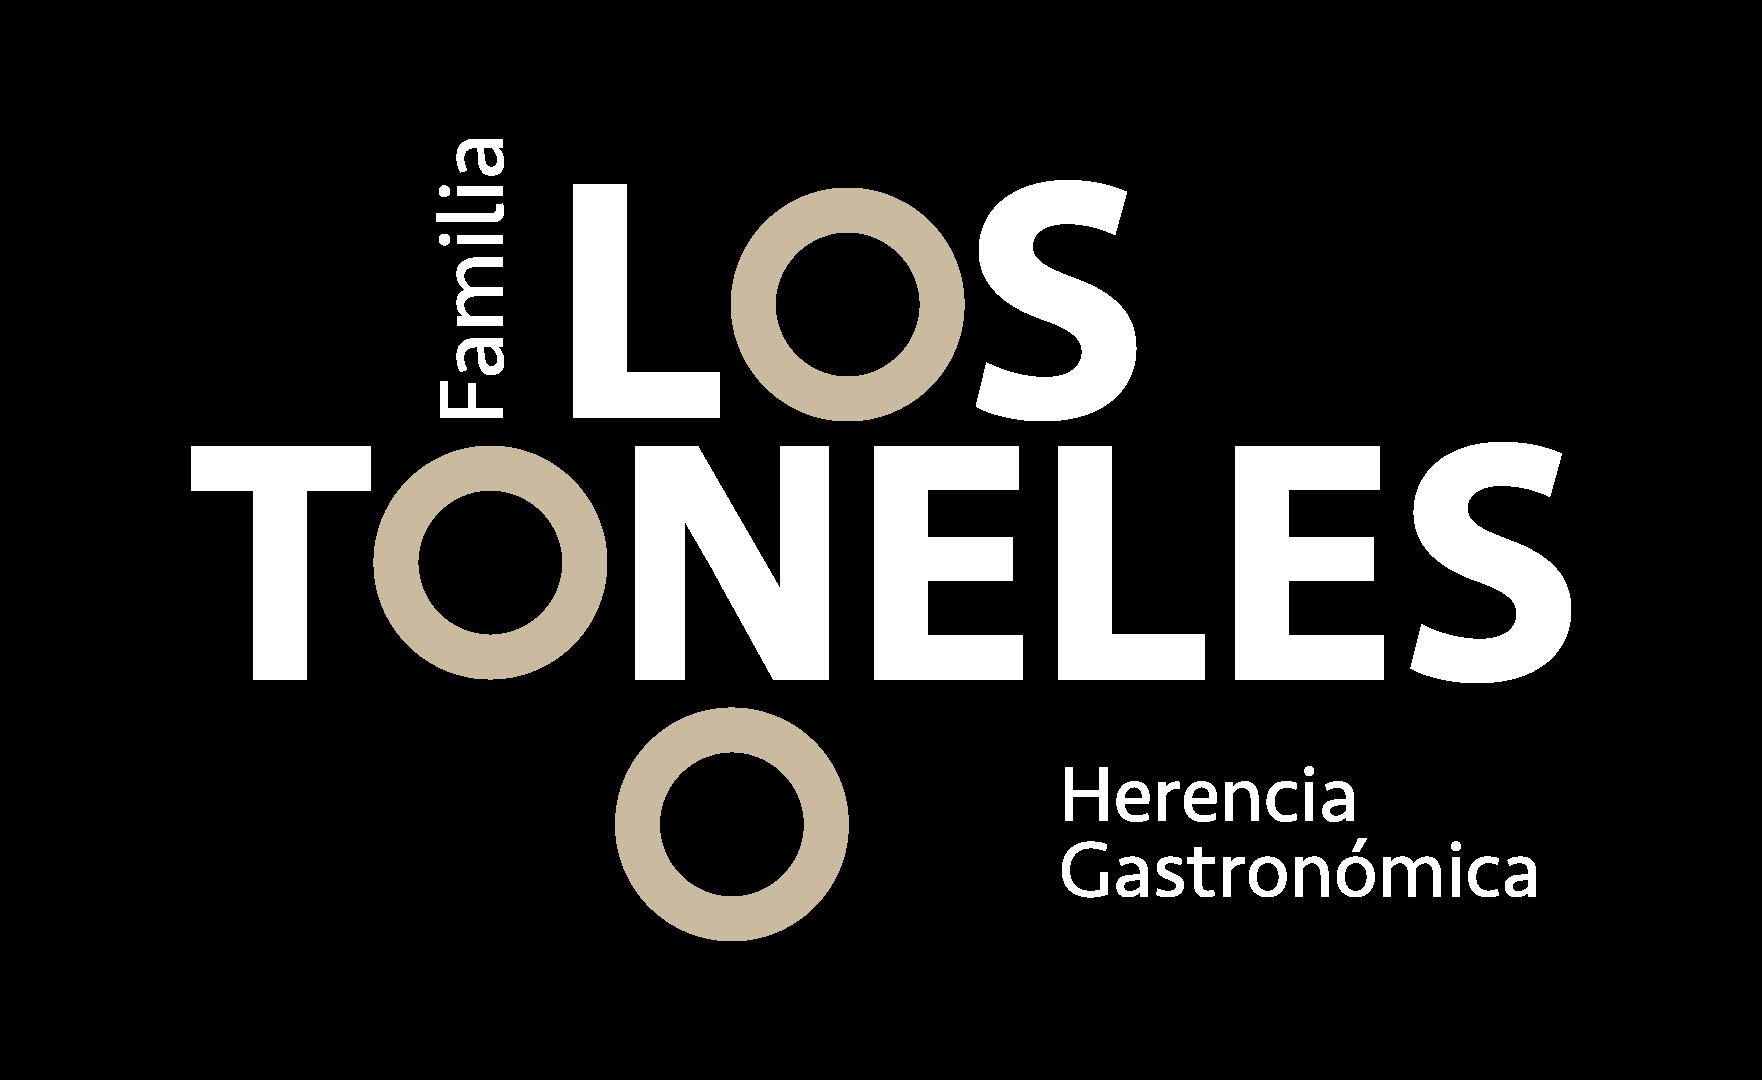 logo-img-home-familia-los-toneles-herencia-gastronomica-2